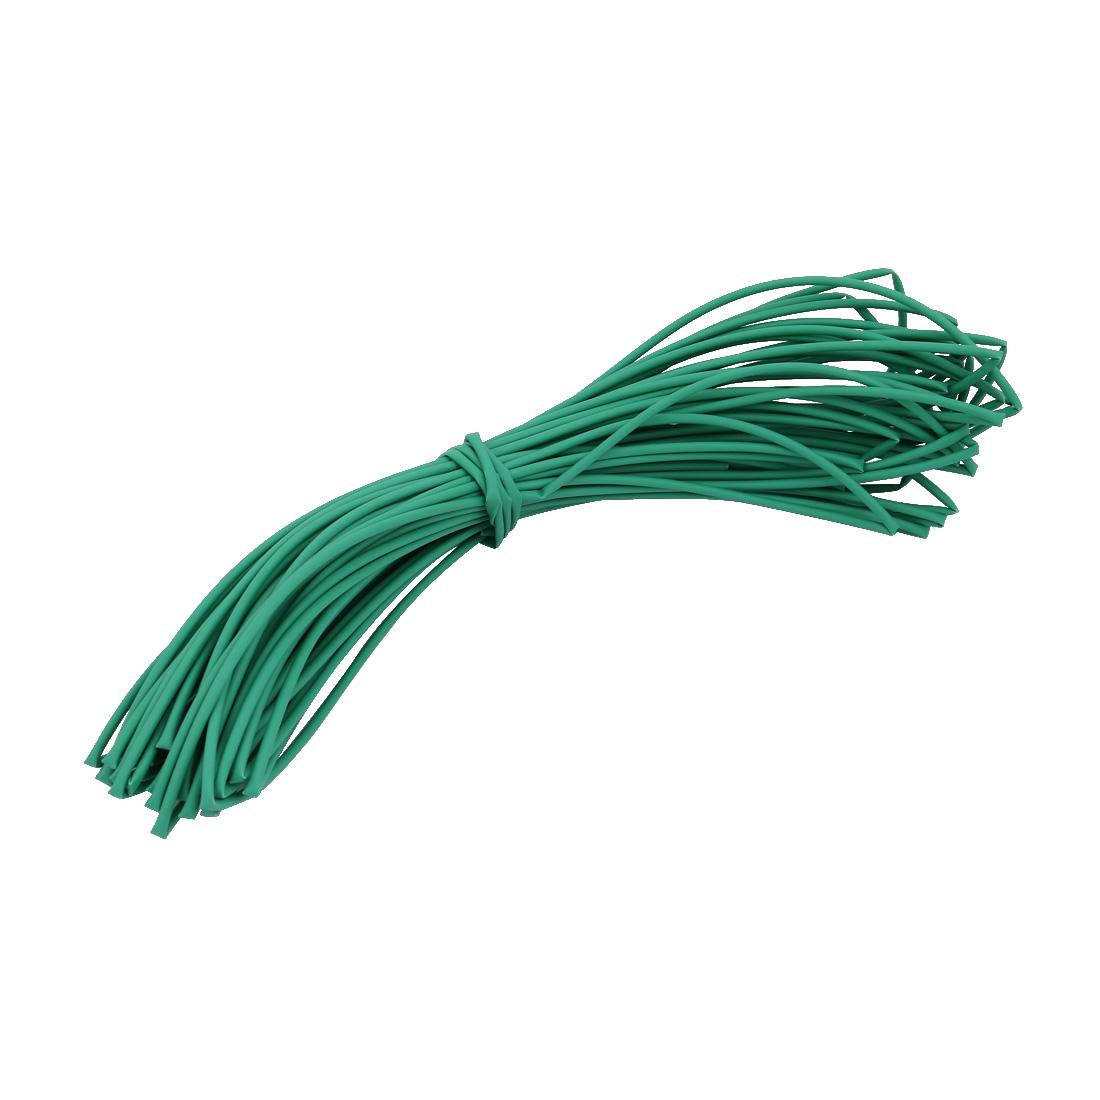 20M 0.08in Inner Dia Polyolefin Flame Retardant Tube Green for Wire Repairing